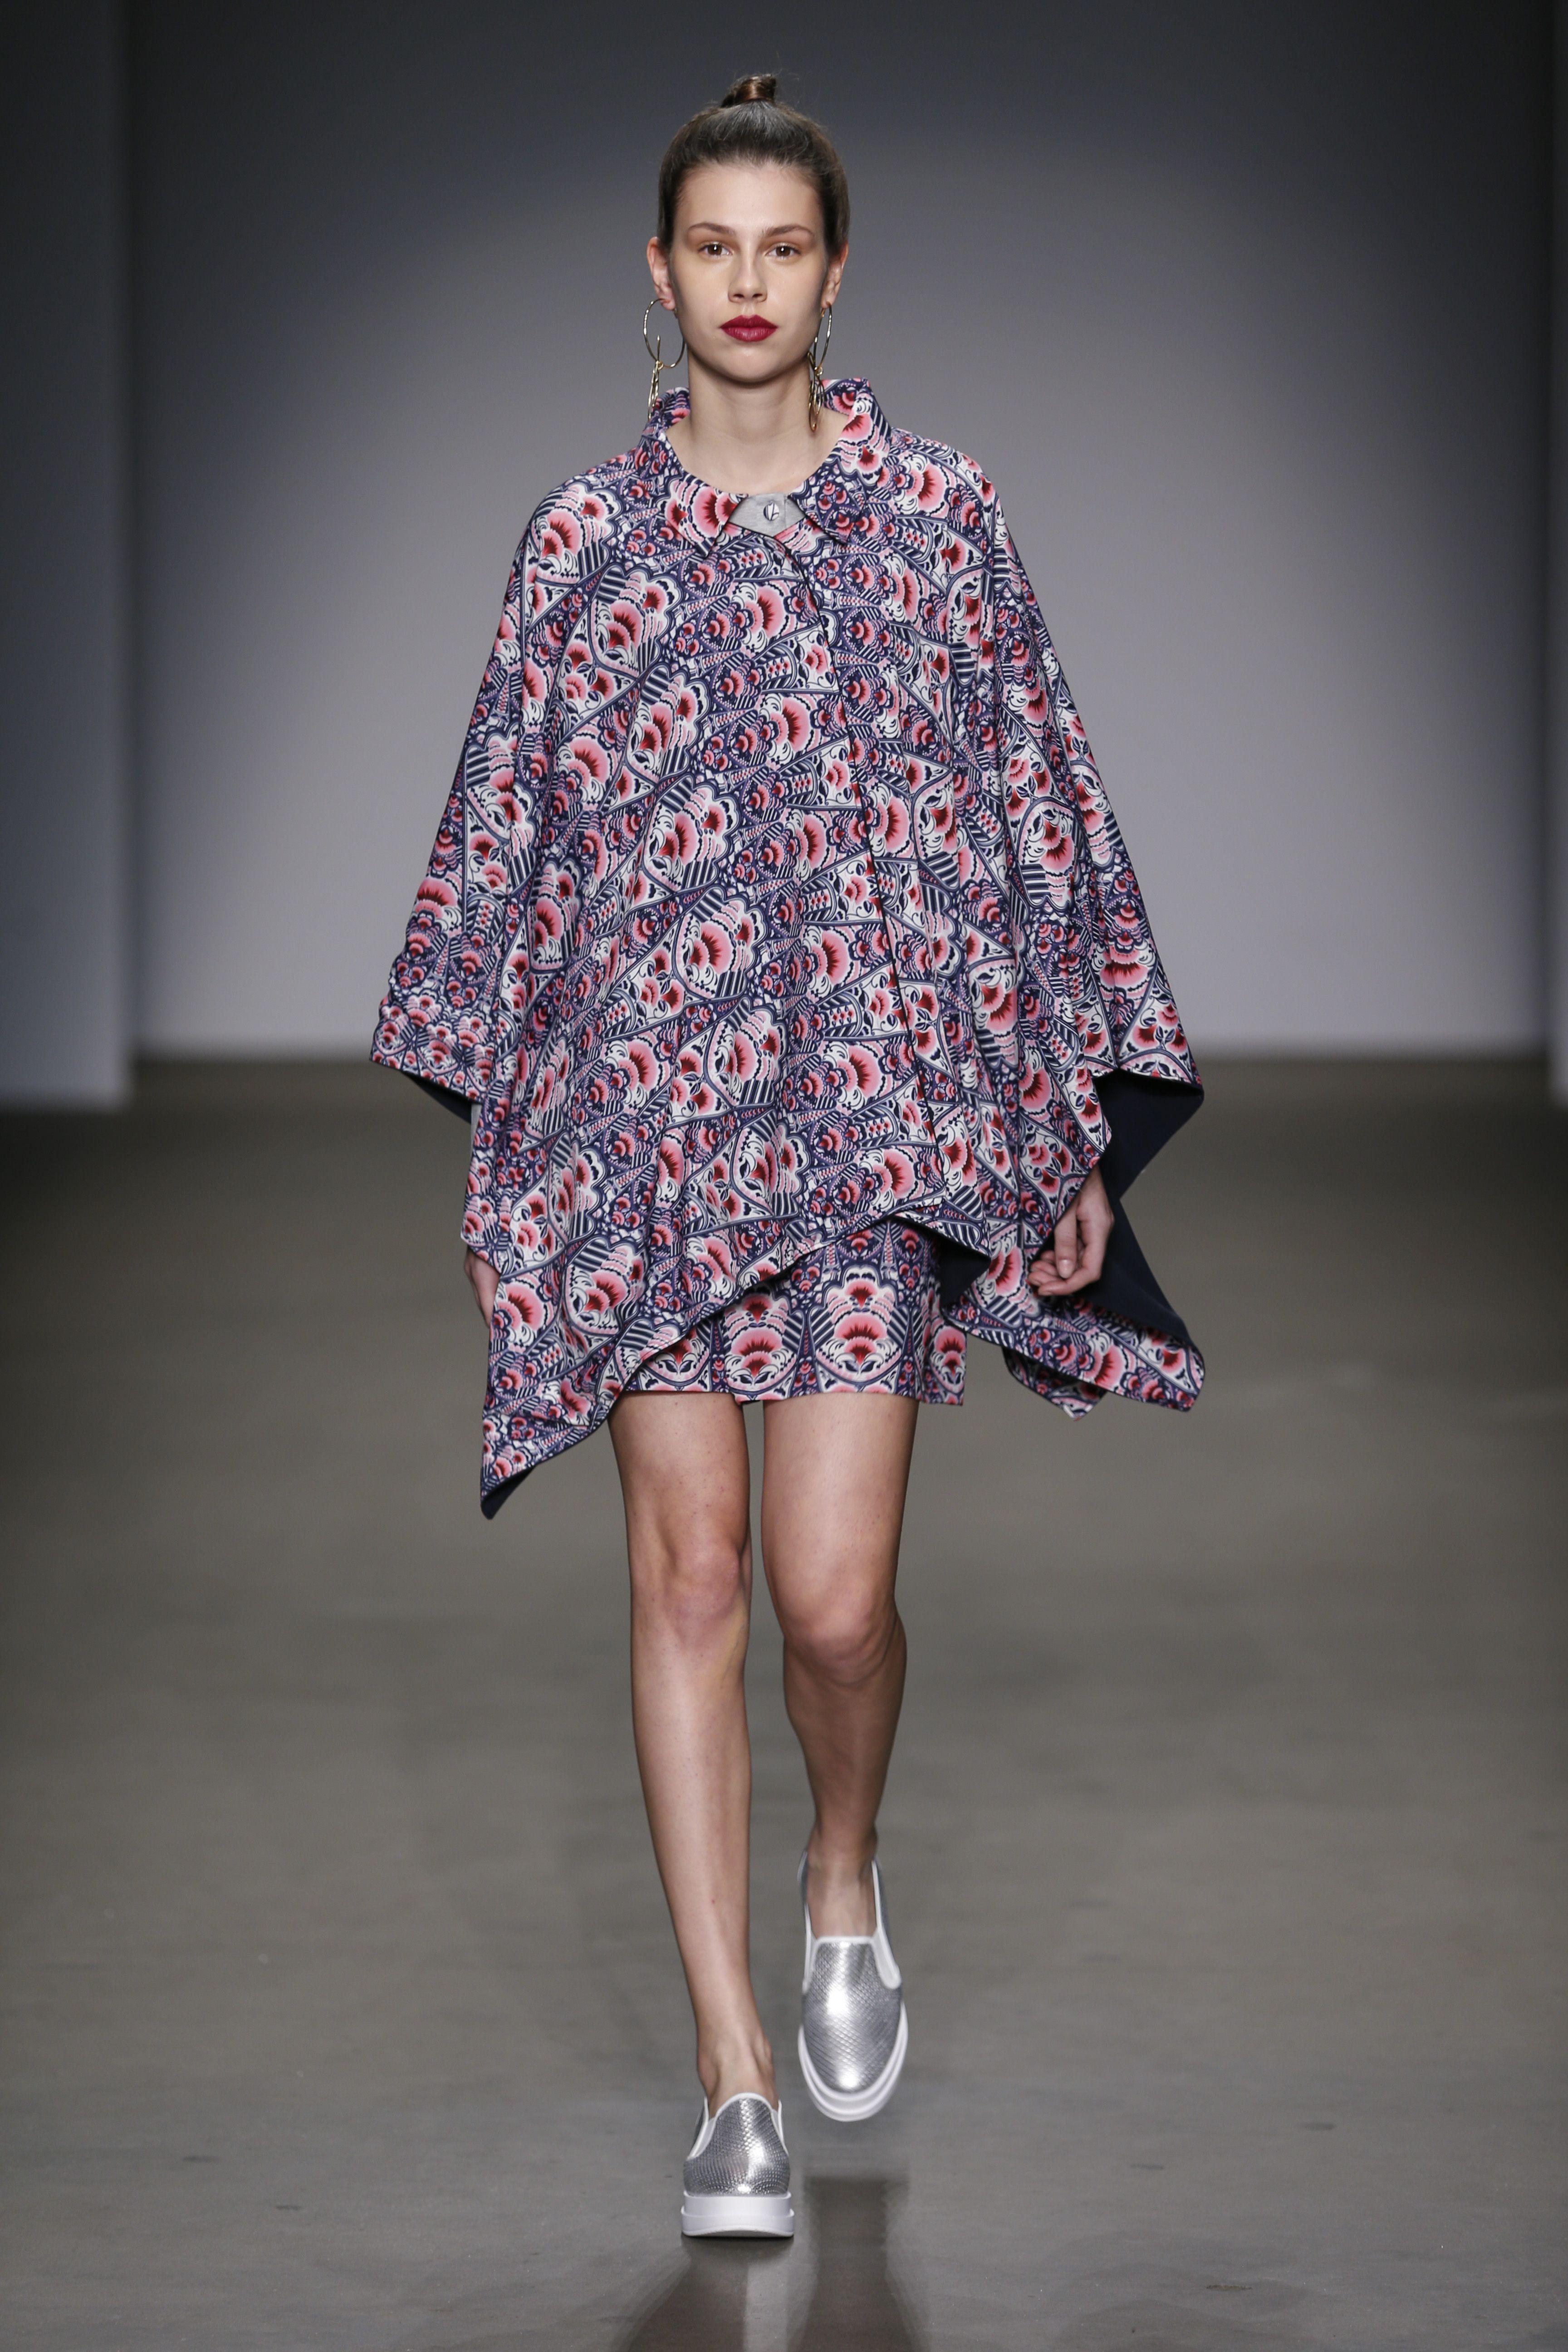 Amsterdam International Fashion Week 16 juli   Het Parool